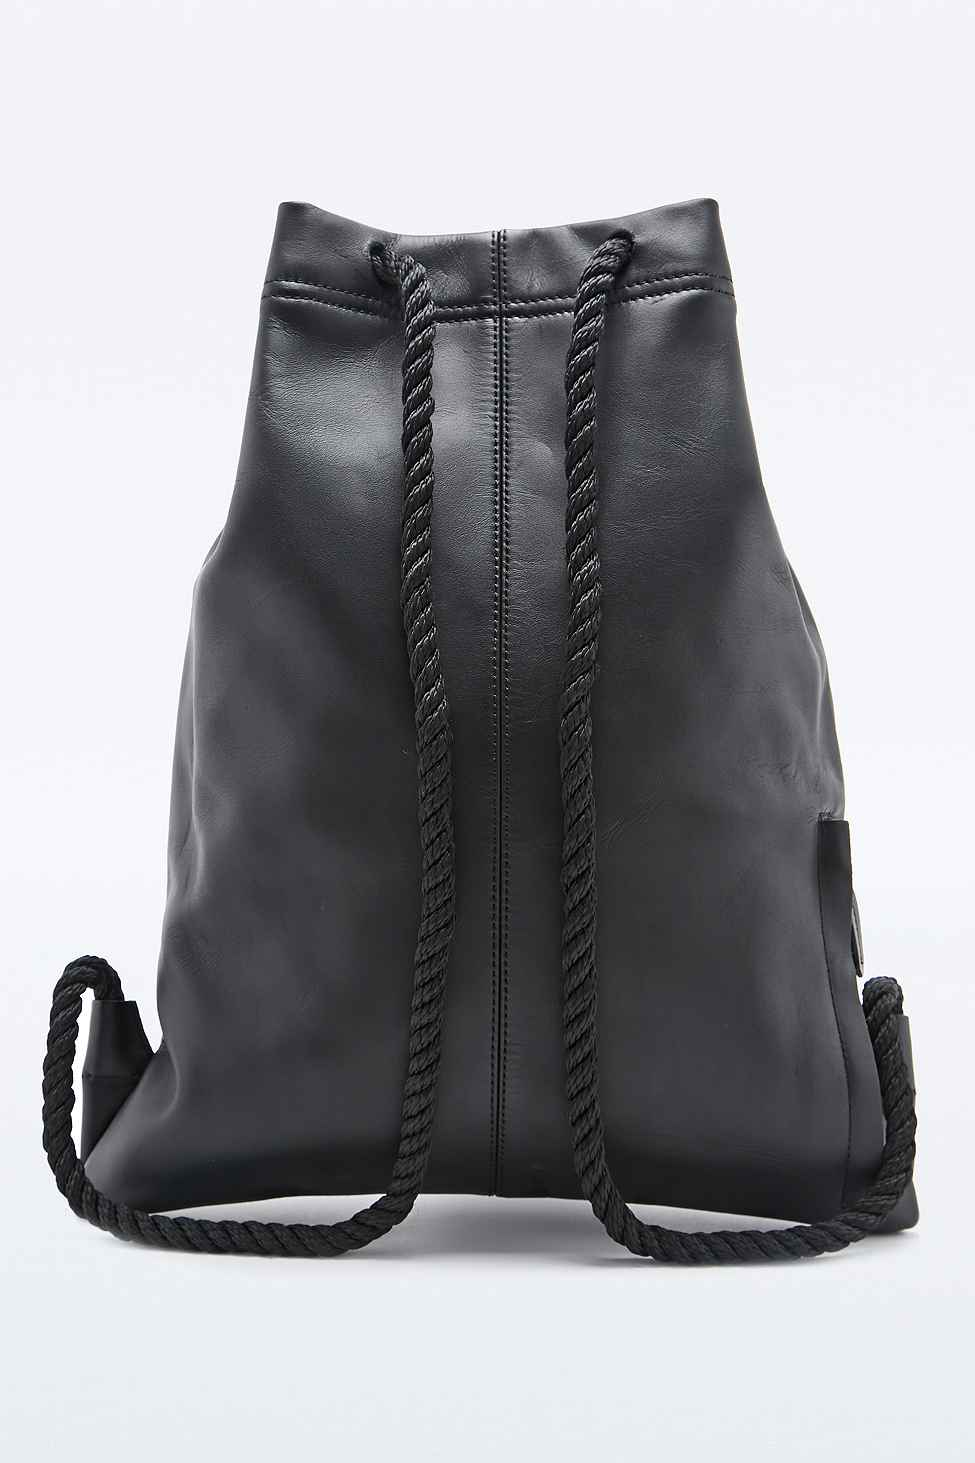 46e739745e Stighlorgan Driscoll Leather Drawstring Bag In Black in Black for ...